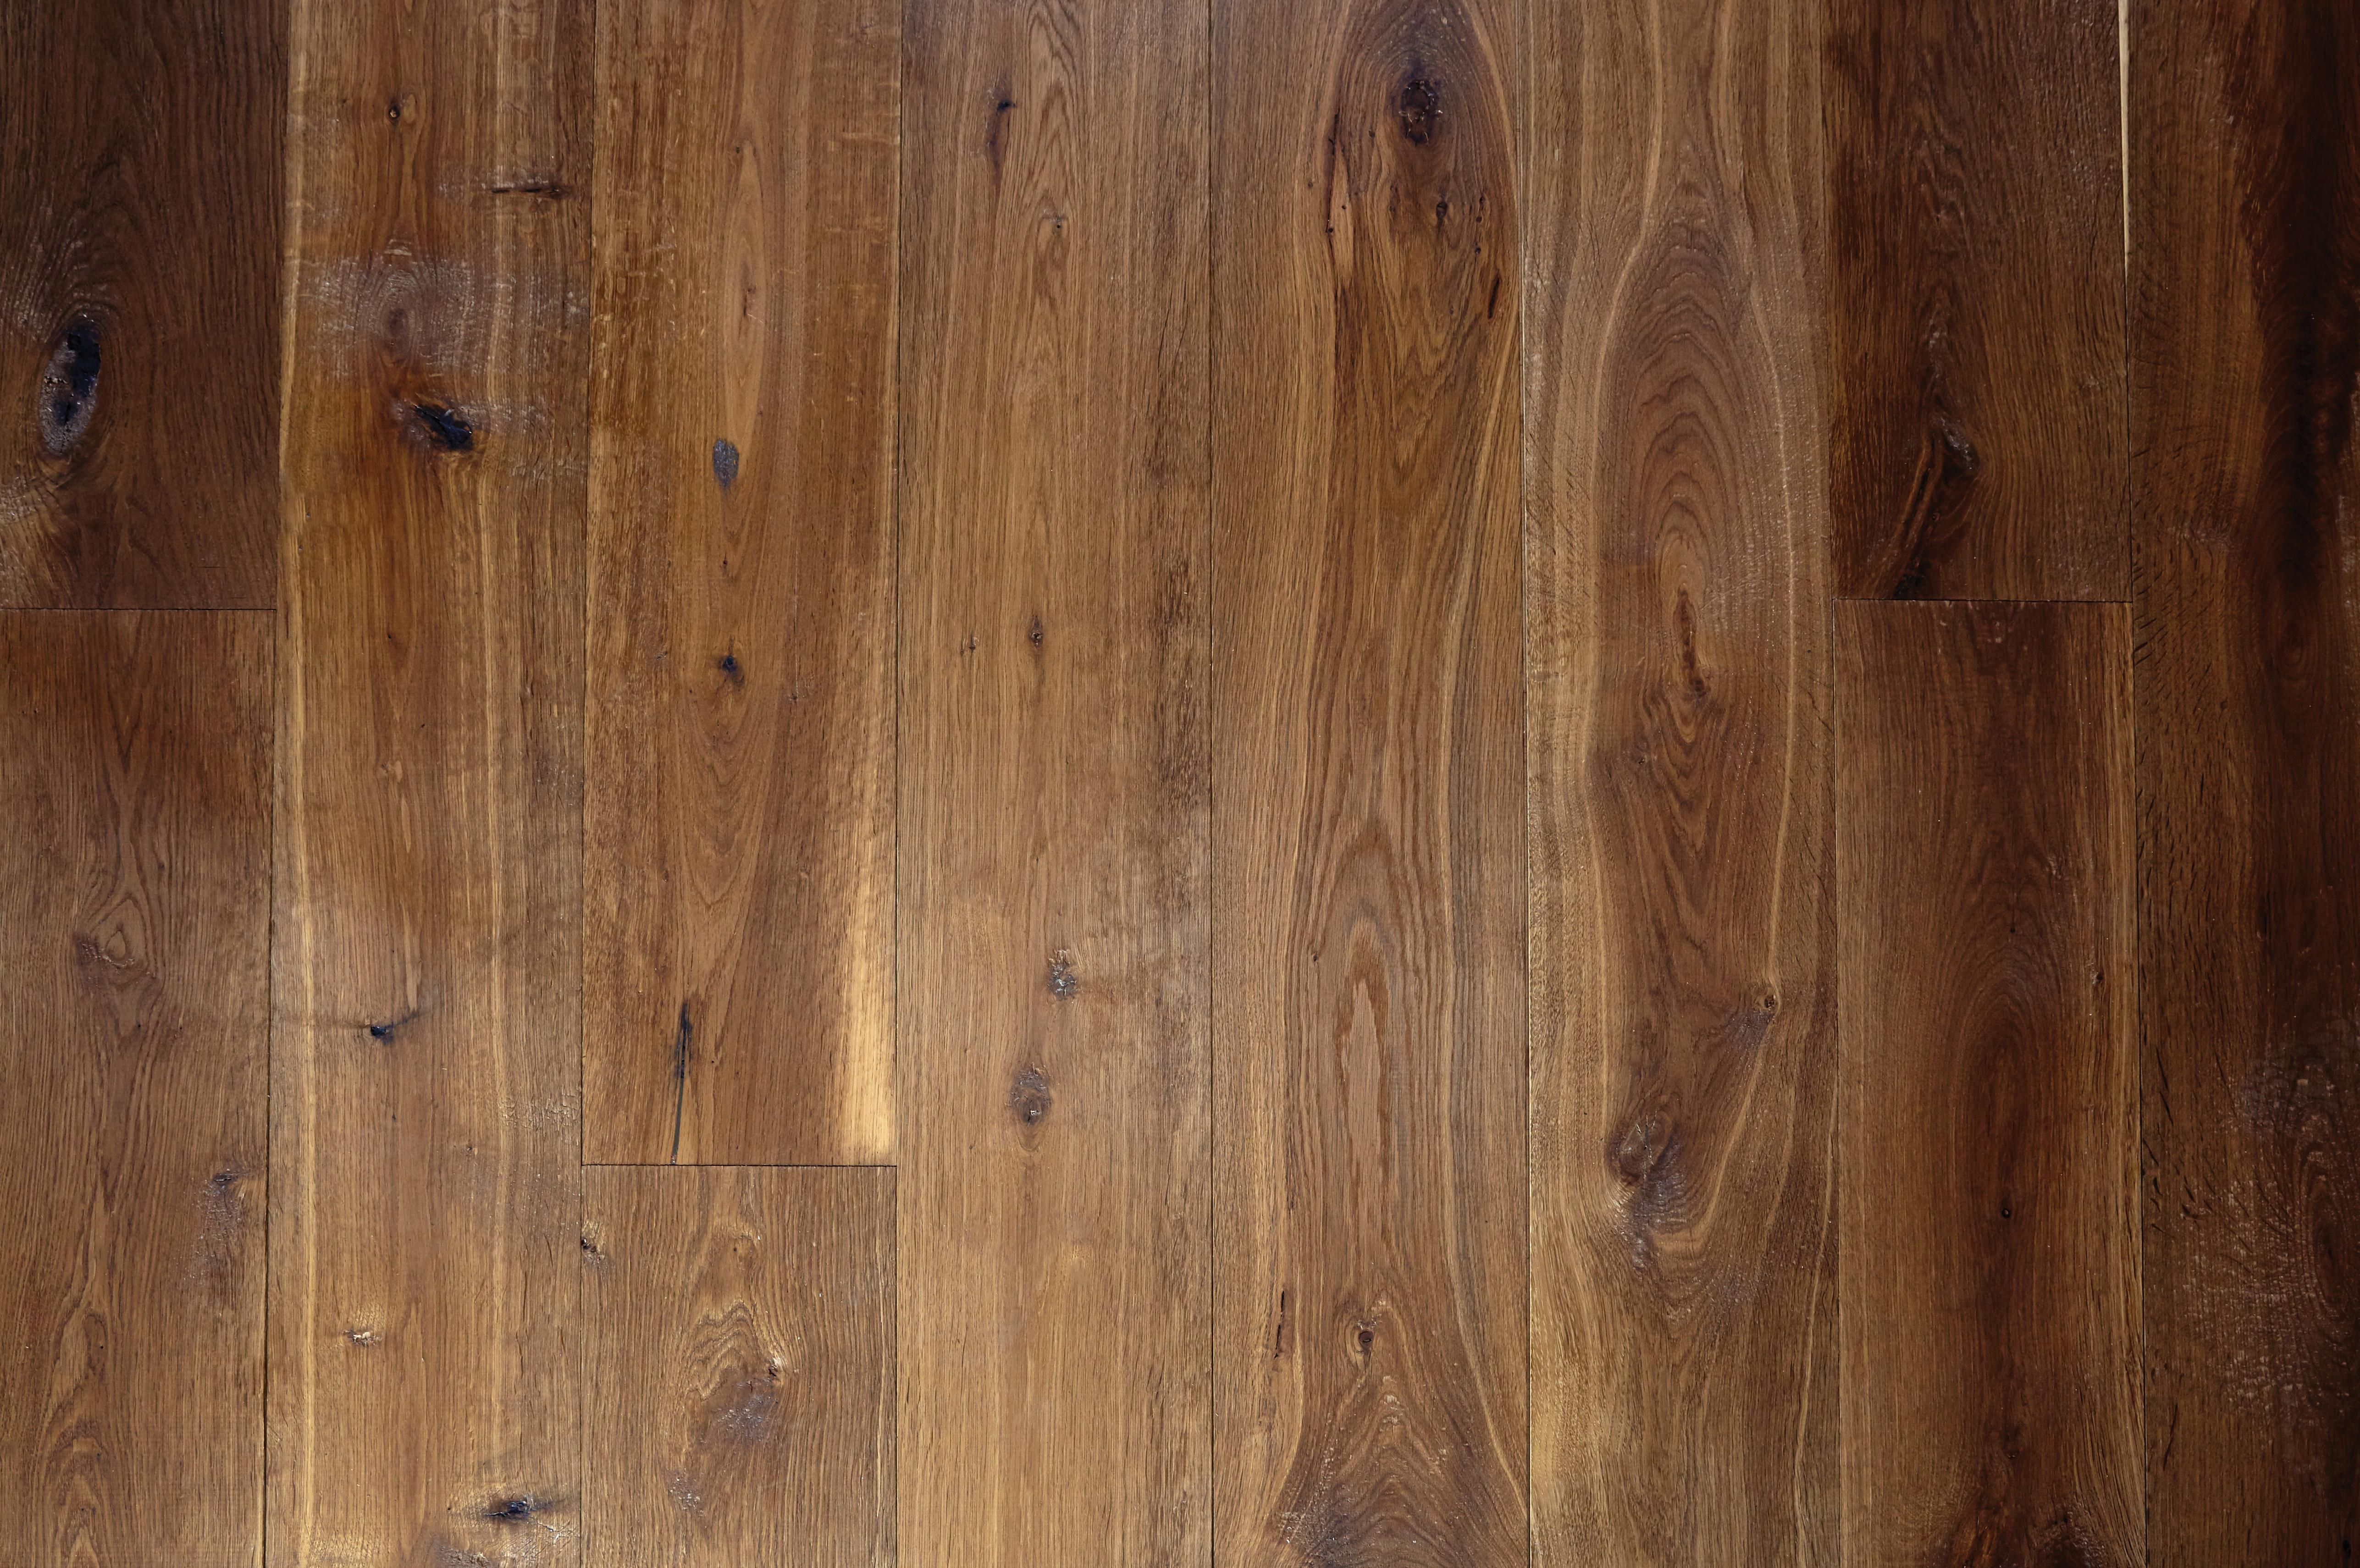 Charming Chicago Hardwood Flooring Specialties Part - 11: Read More